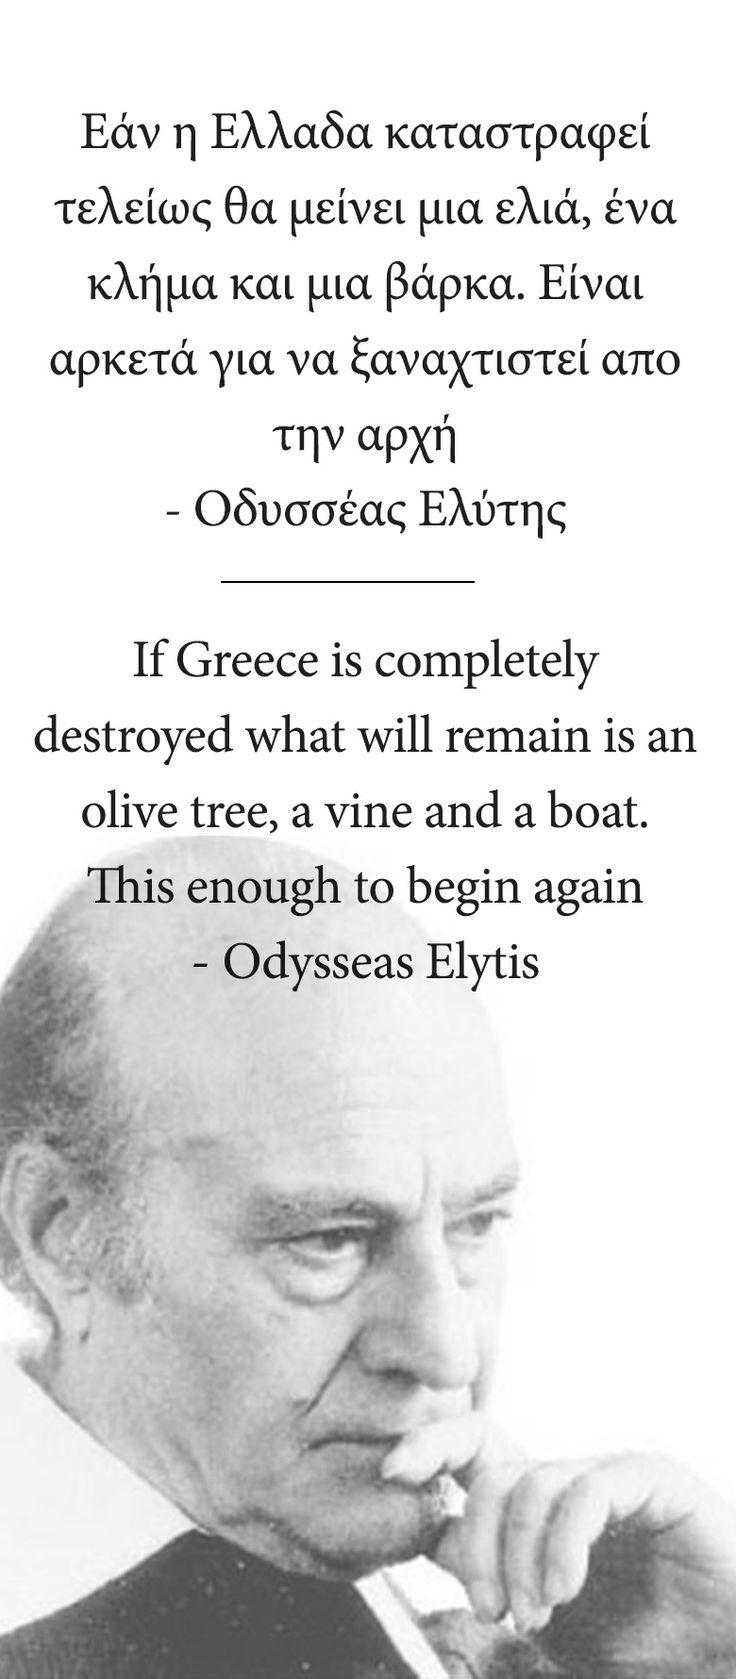 - Odysseas Elytis